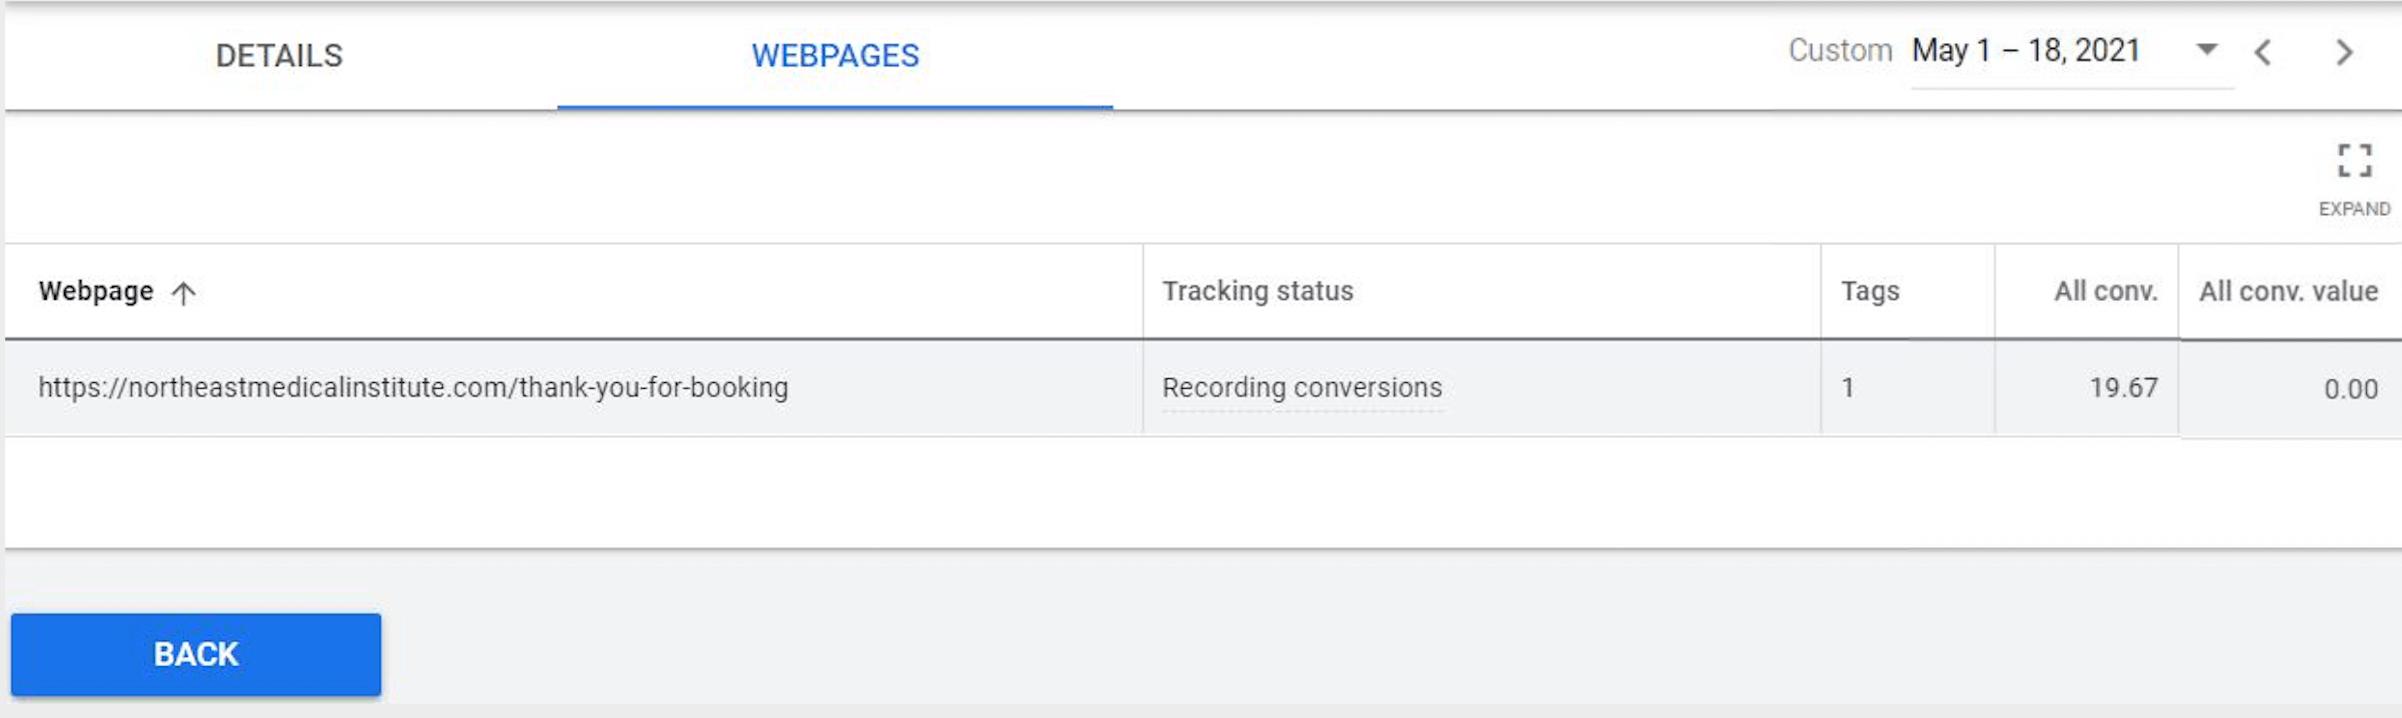 google ads conversion tracking webpage tab